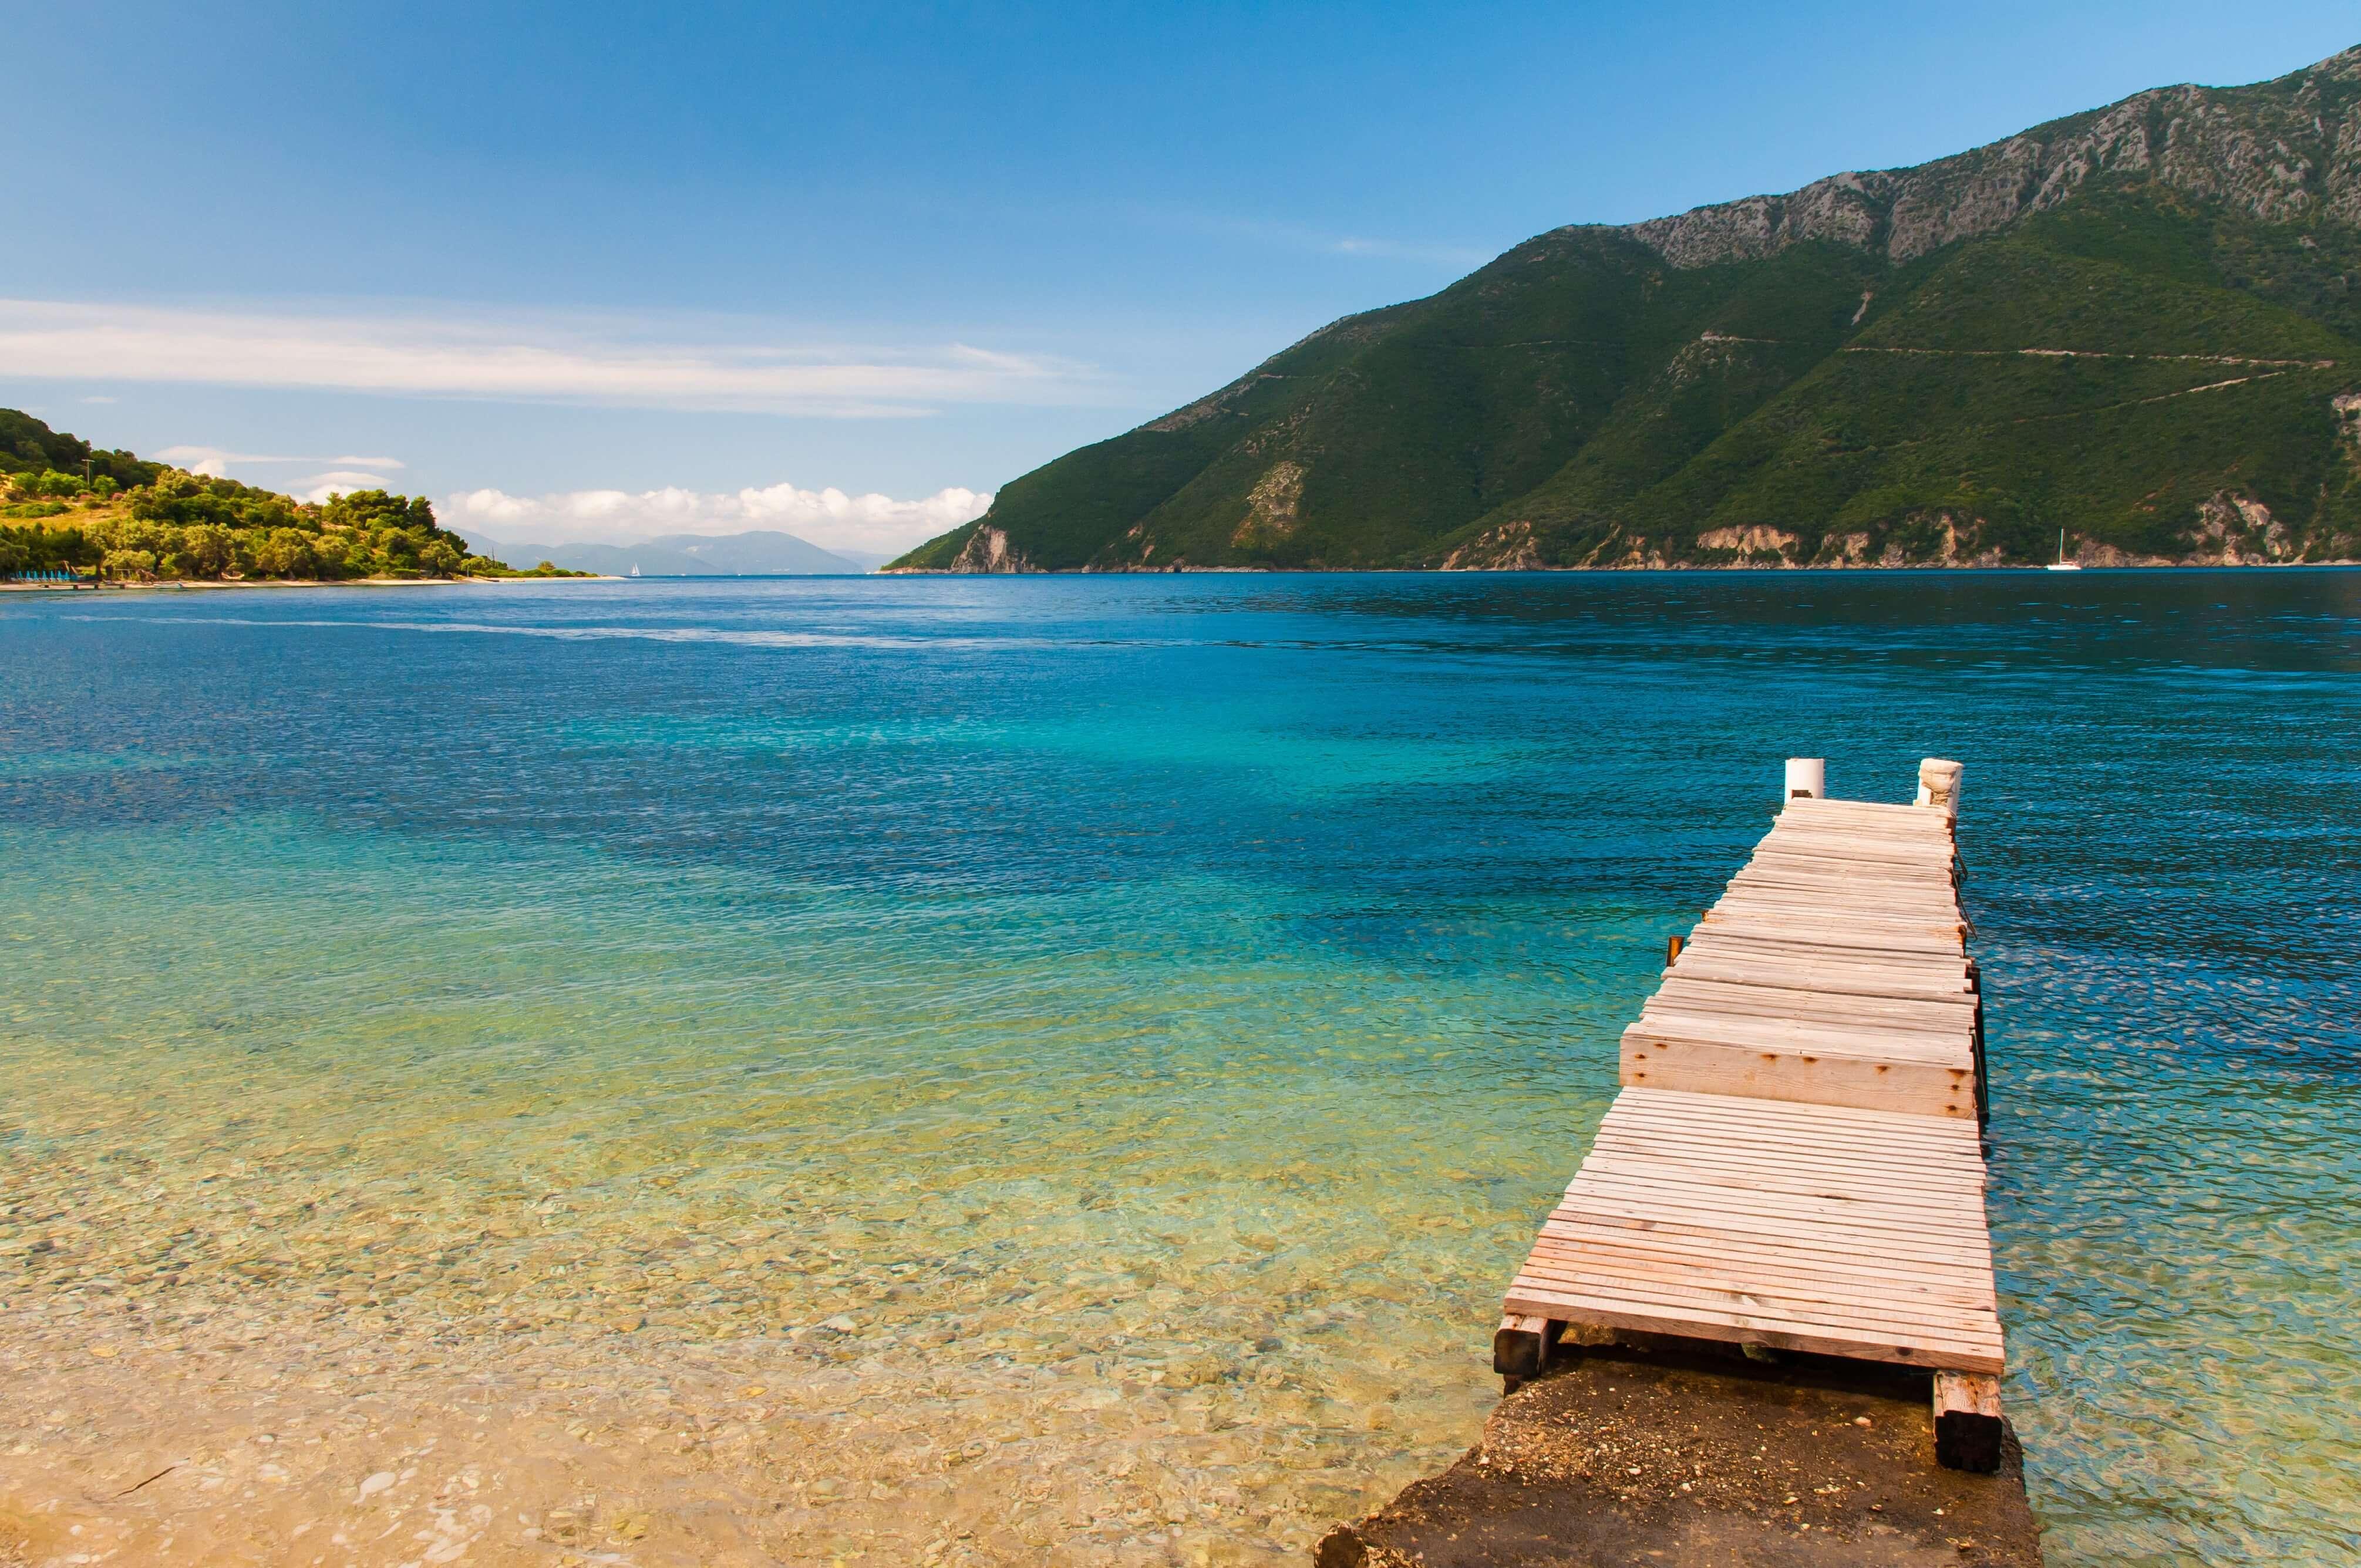 Take a refreshing dip along the coastline of Meganisi island in Greece.